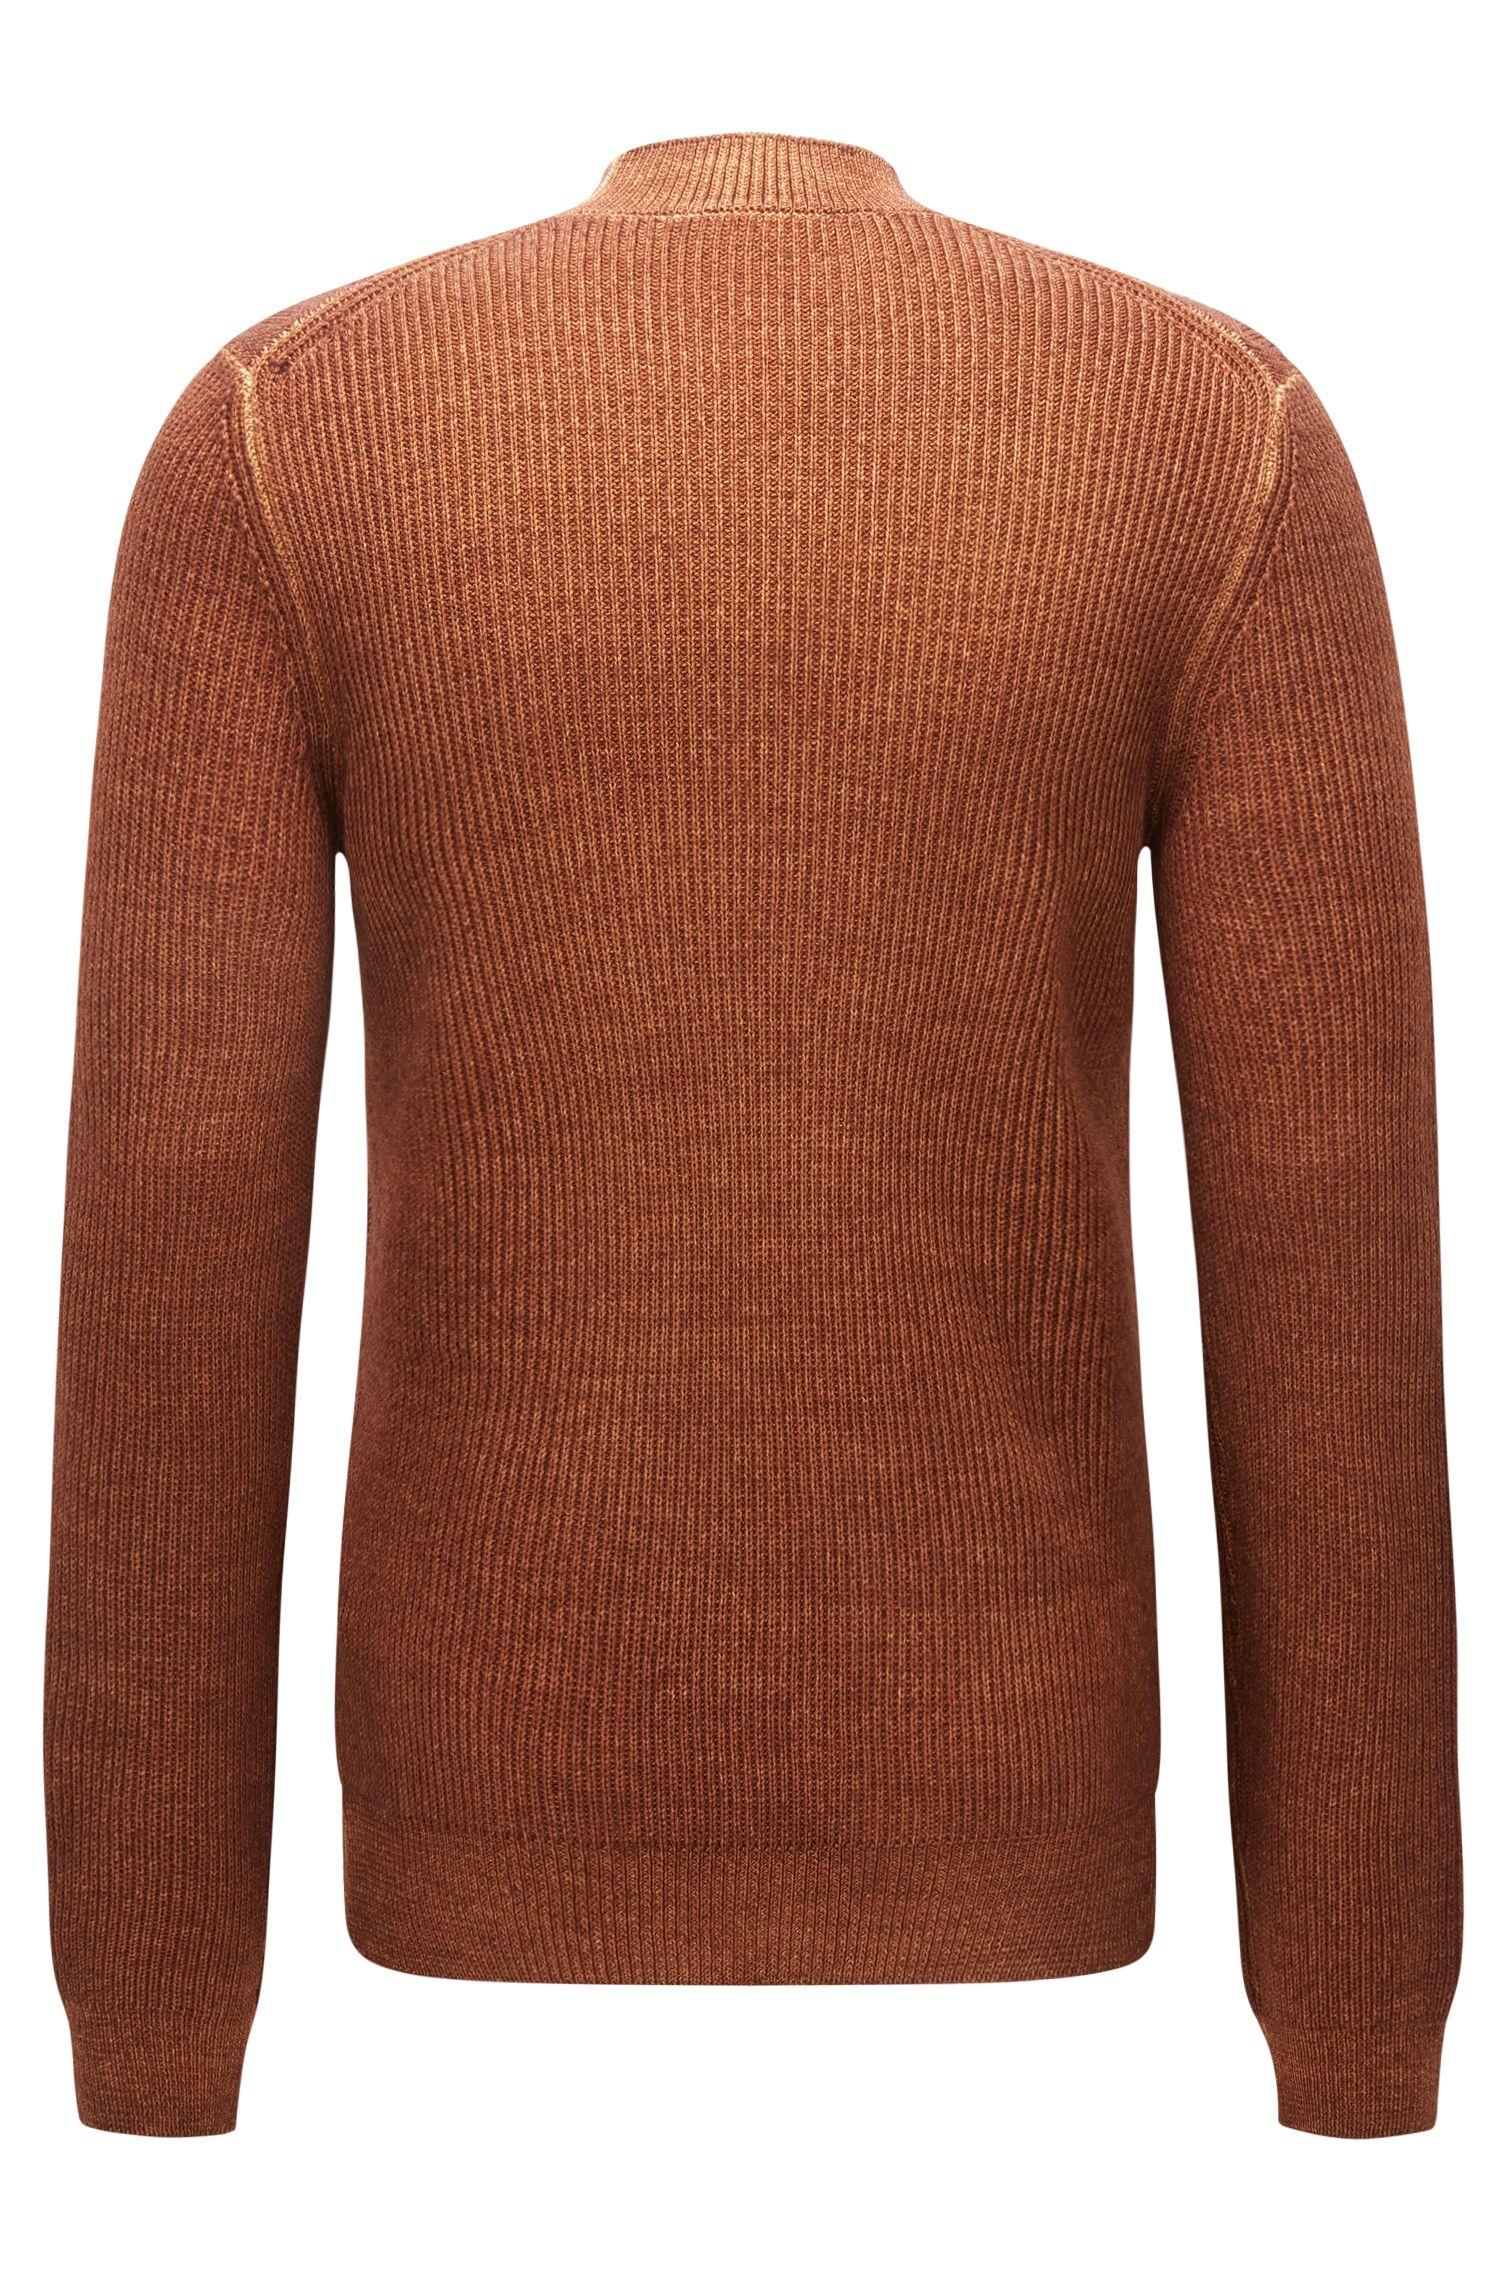 Cable Knit Merino Wool Sweater | Nicaro